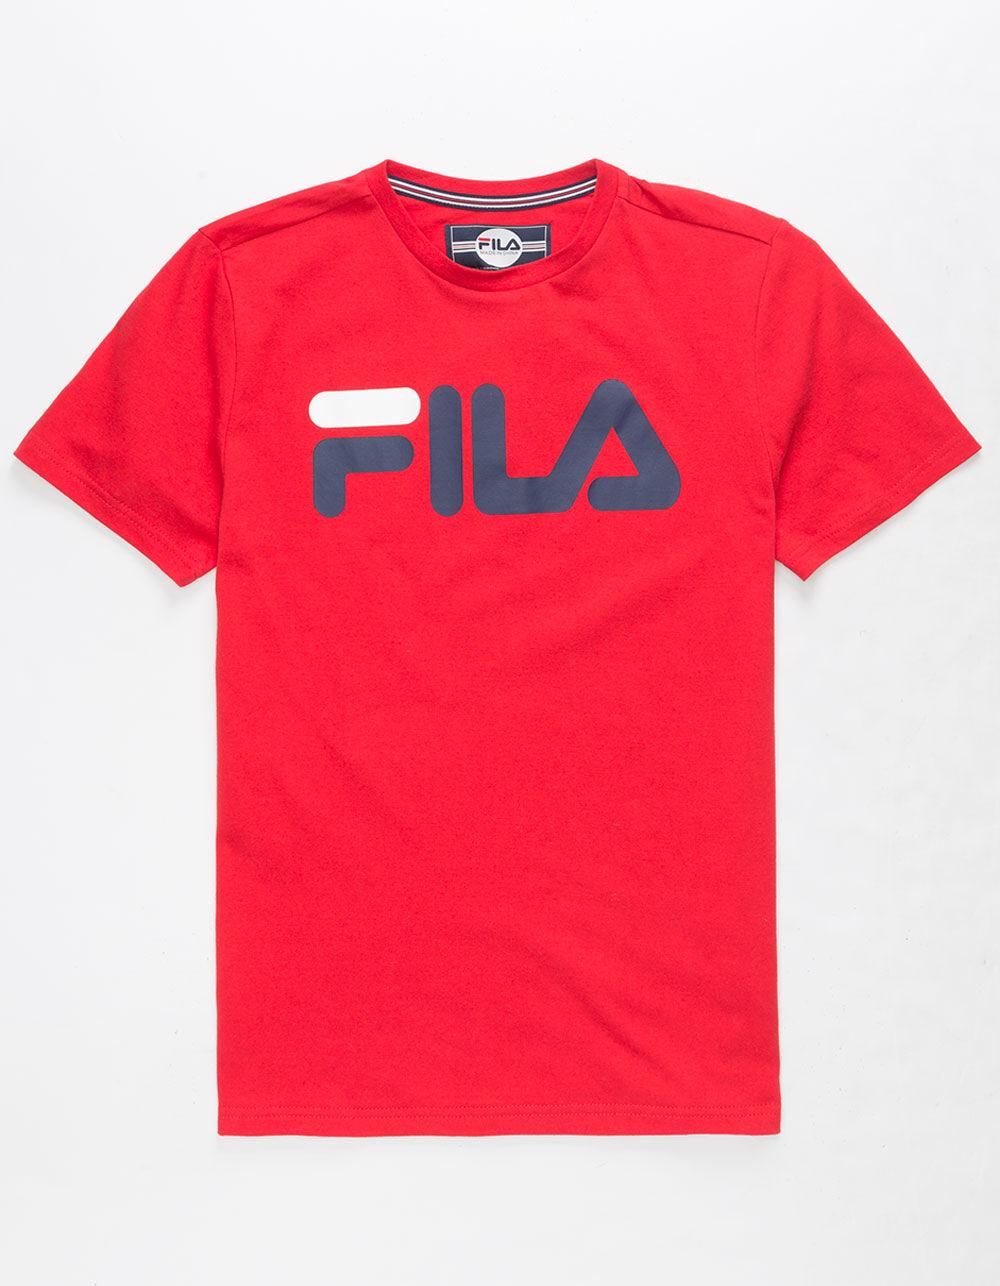 FILA Classic Logo Red Boys T-Shirt